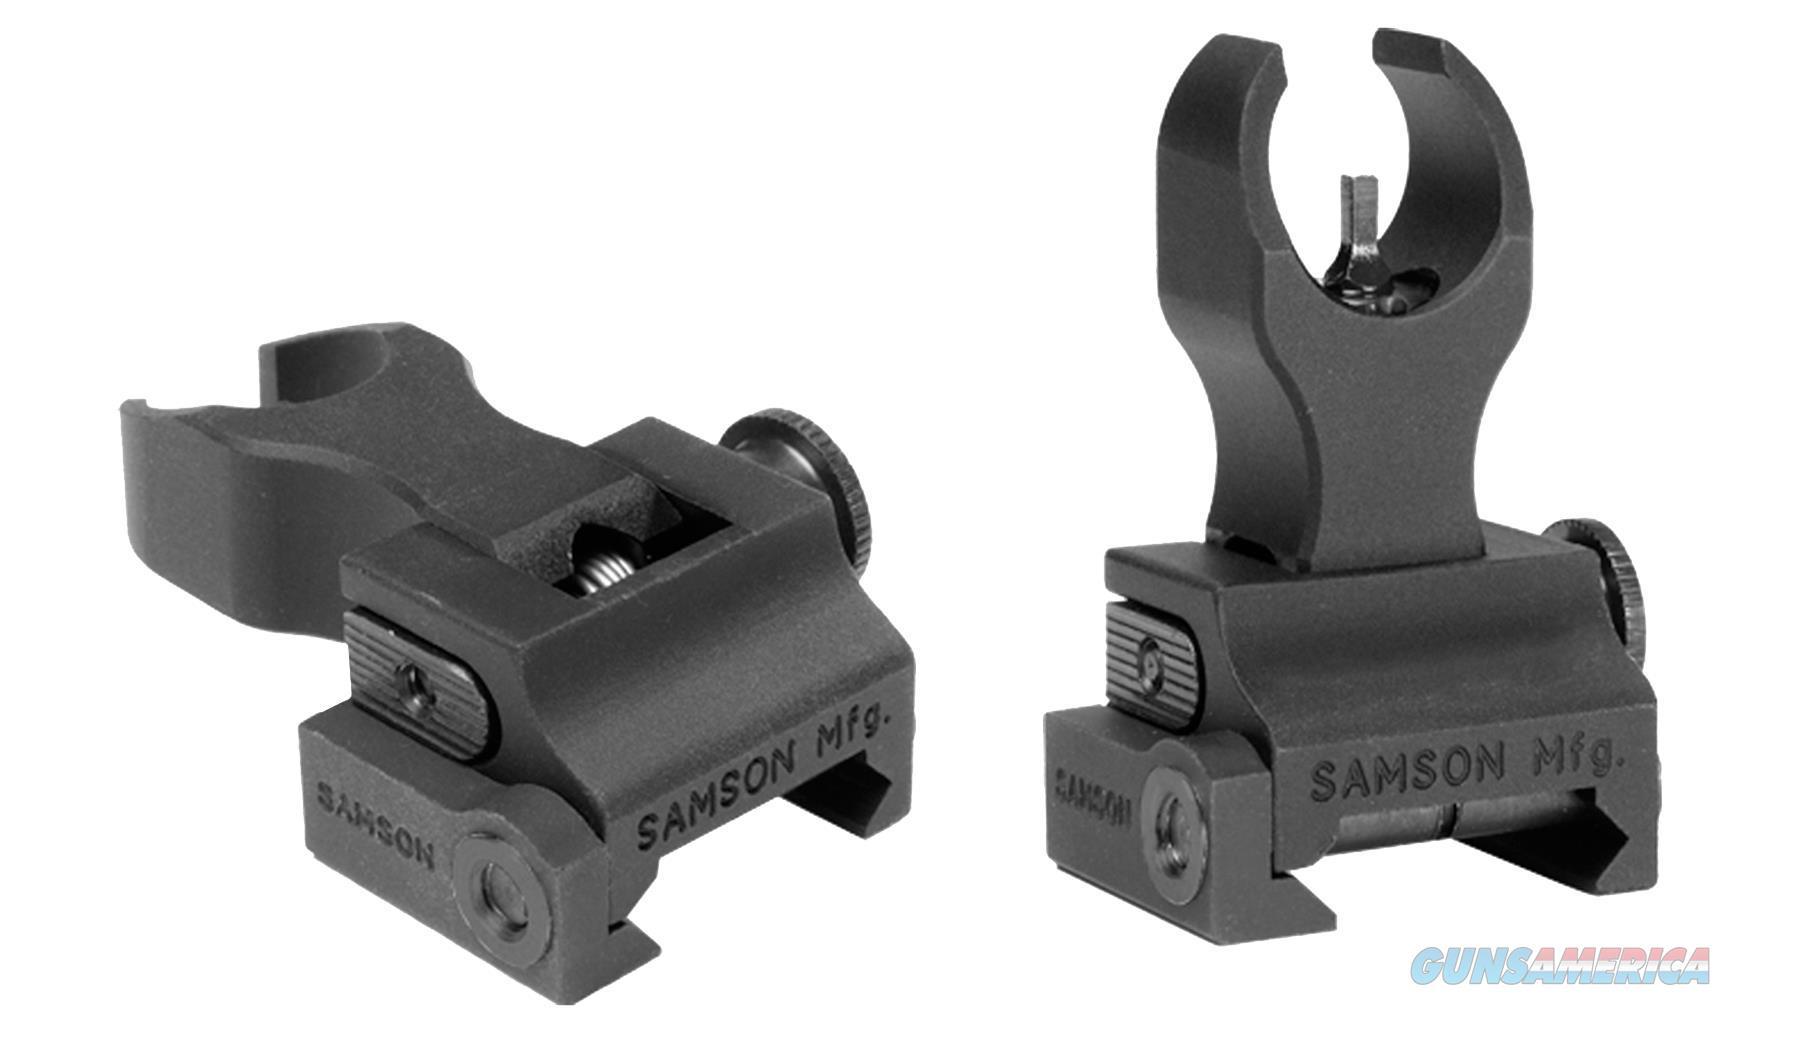 Samson Fxf-Hk Quick Flip A2 Front Rail Mount Ar-15 Alum Black FXF-HK  Non-Guns > Gun Parts > Misc > Rifles